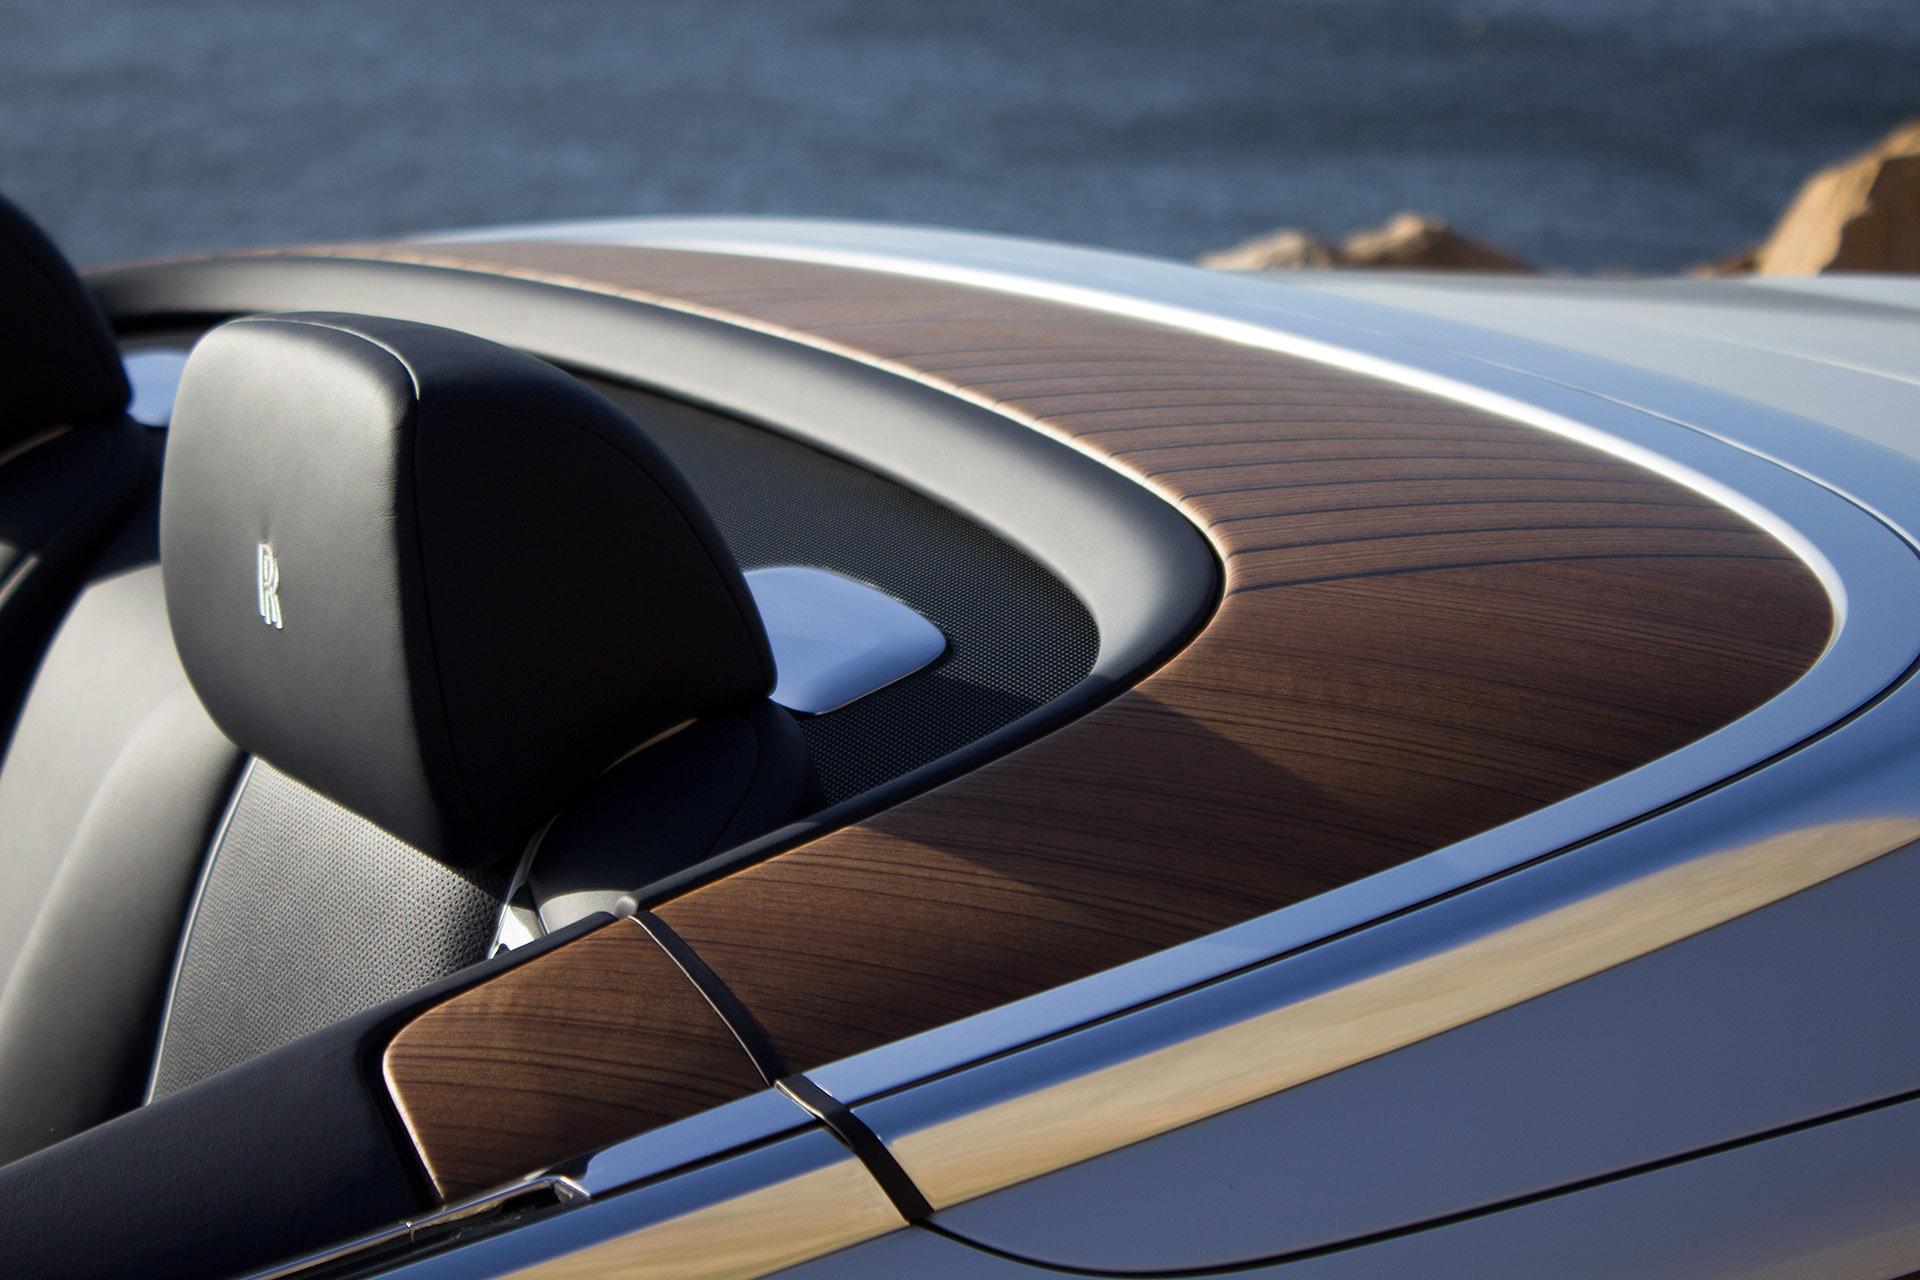 Exotic Car Rental Rockford Il Instant Luxury Rentals